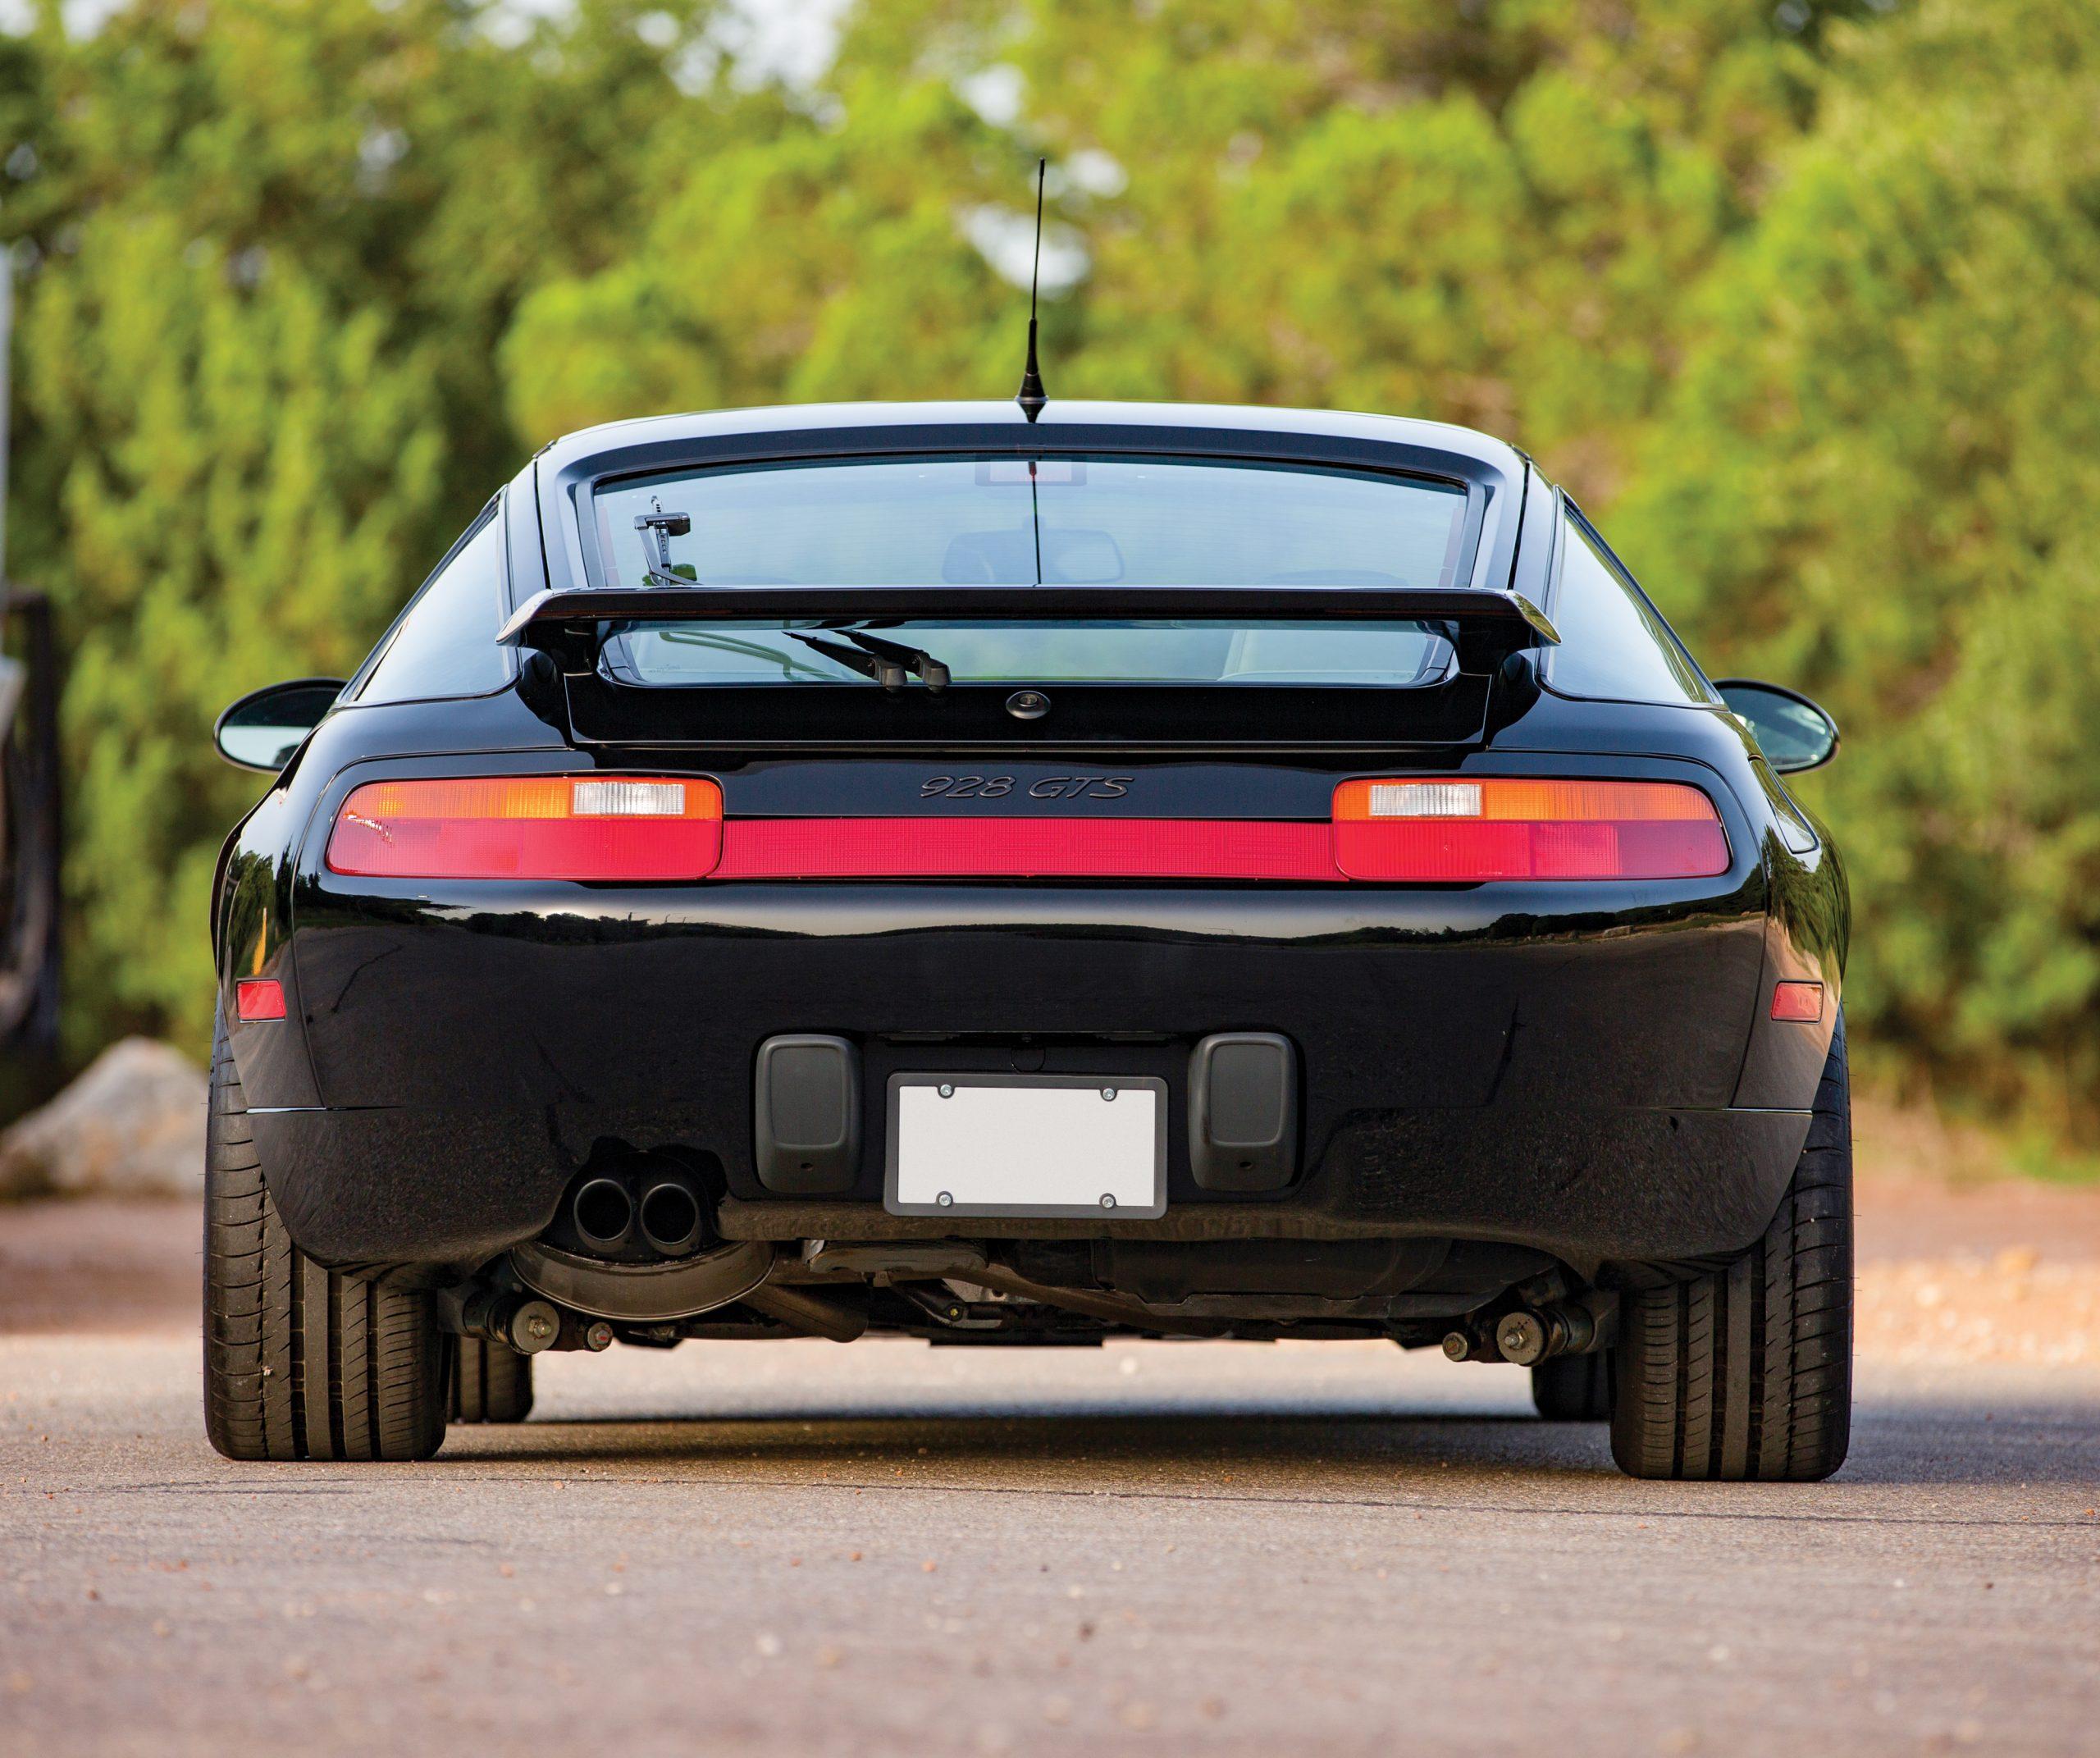 1995 Porsche 928 GTS Rear